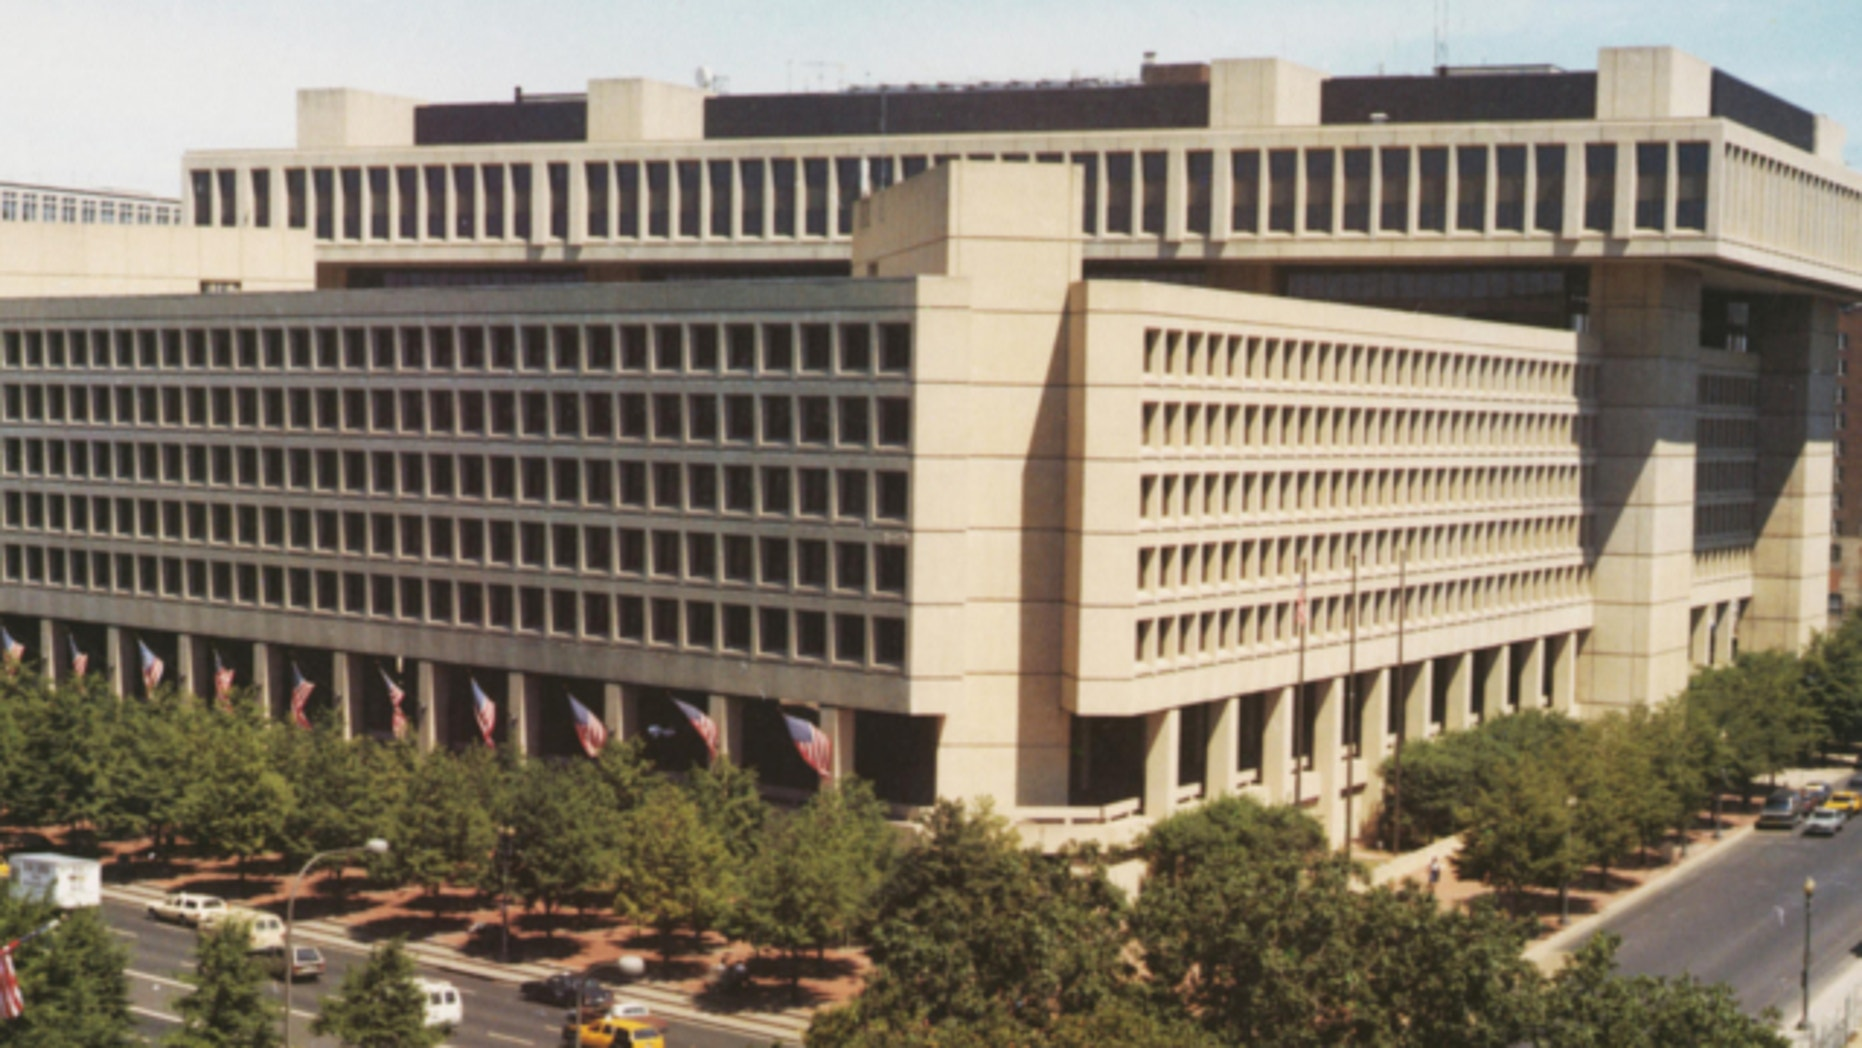 GSA denies Democratic claims that Trump intervened to stop FBI HQ move